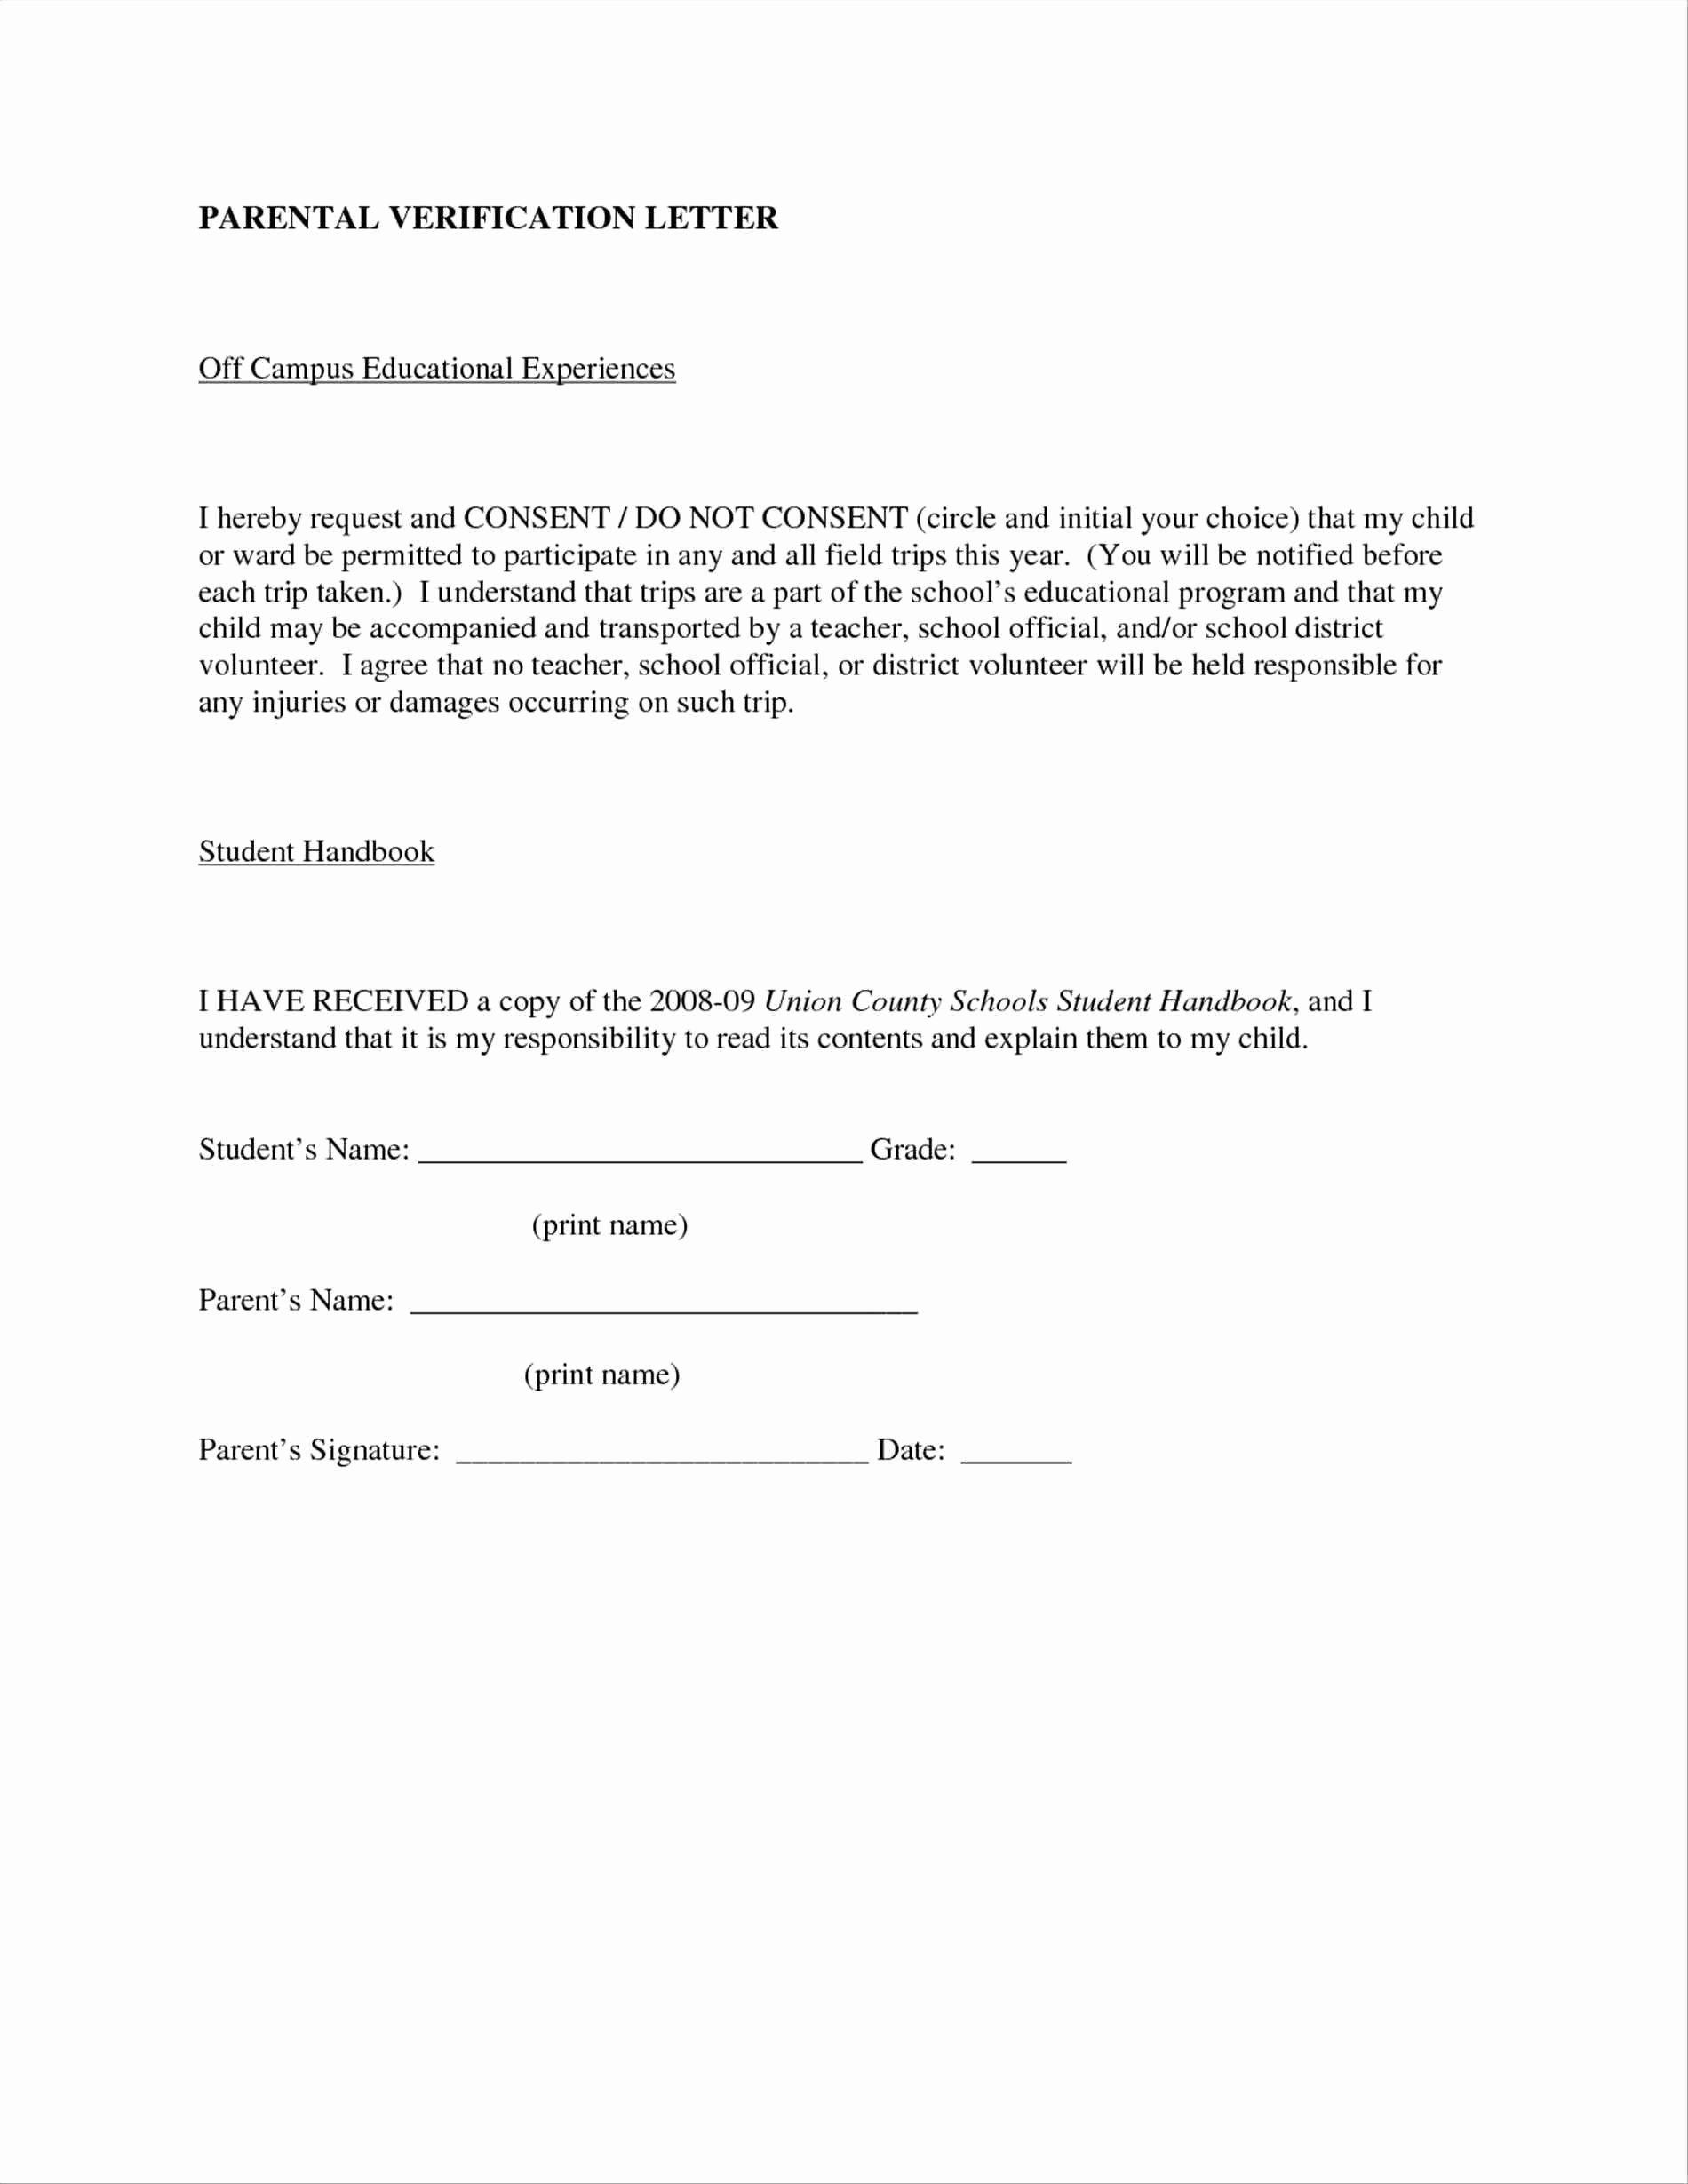 Community Service Verification form Template Elegant Sbar form Template